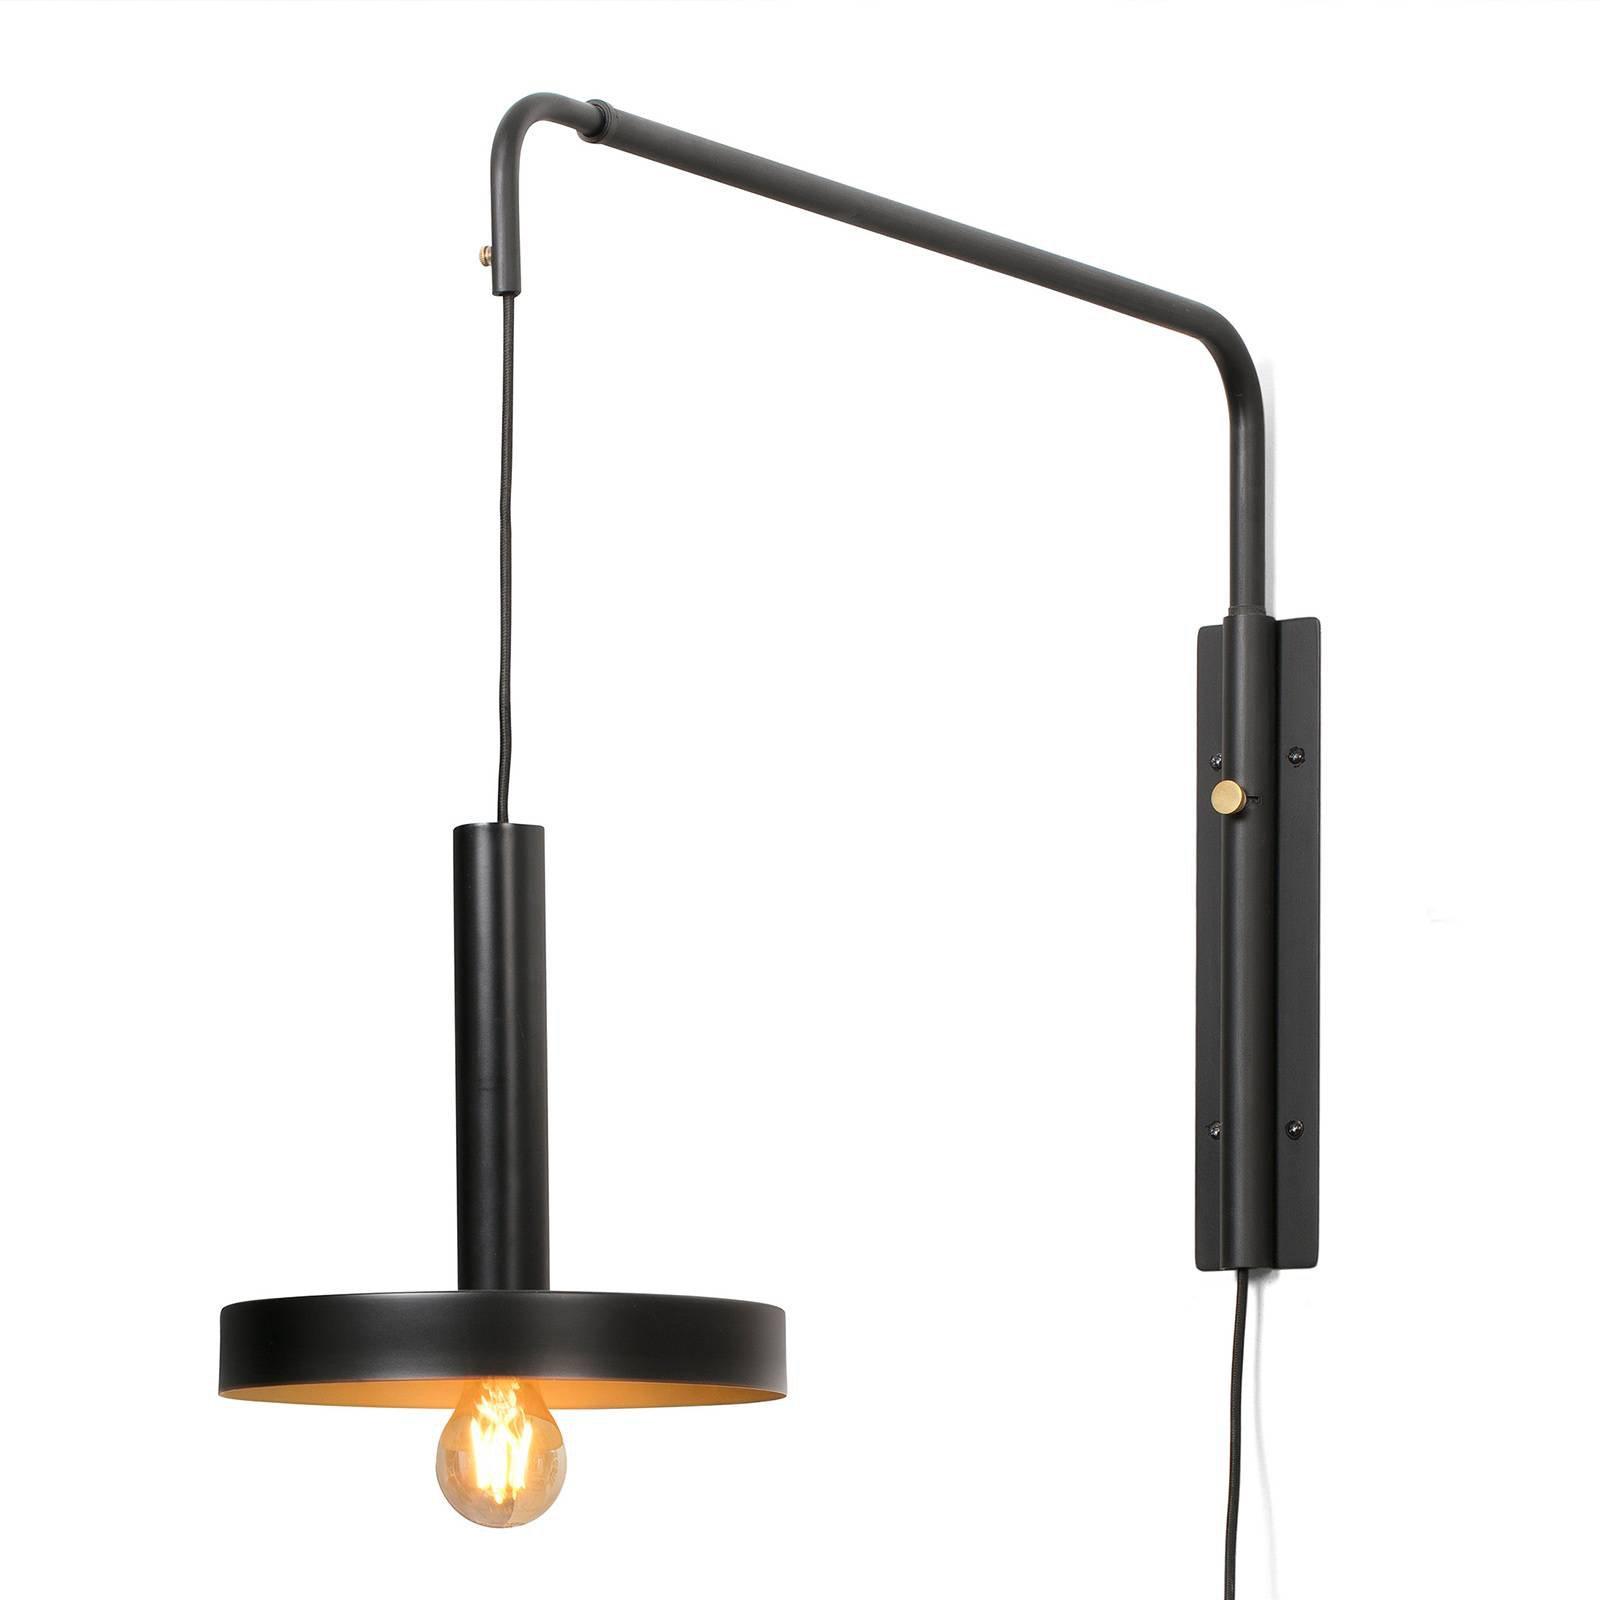 Vegglampe Whizz, svart